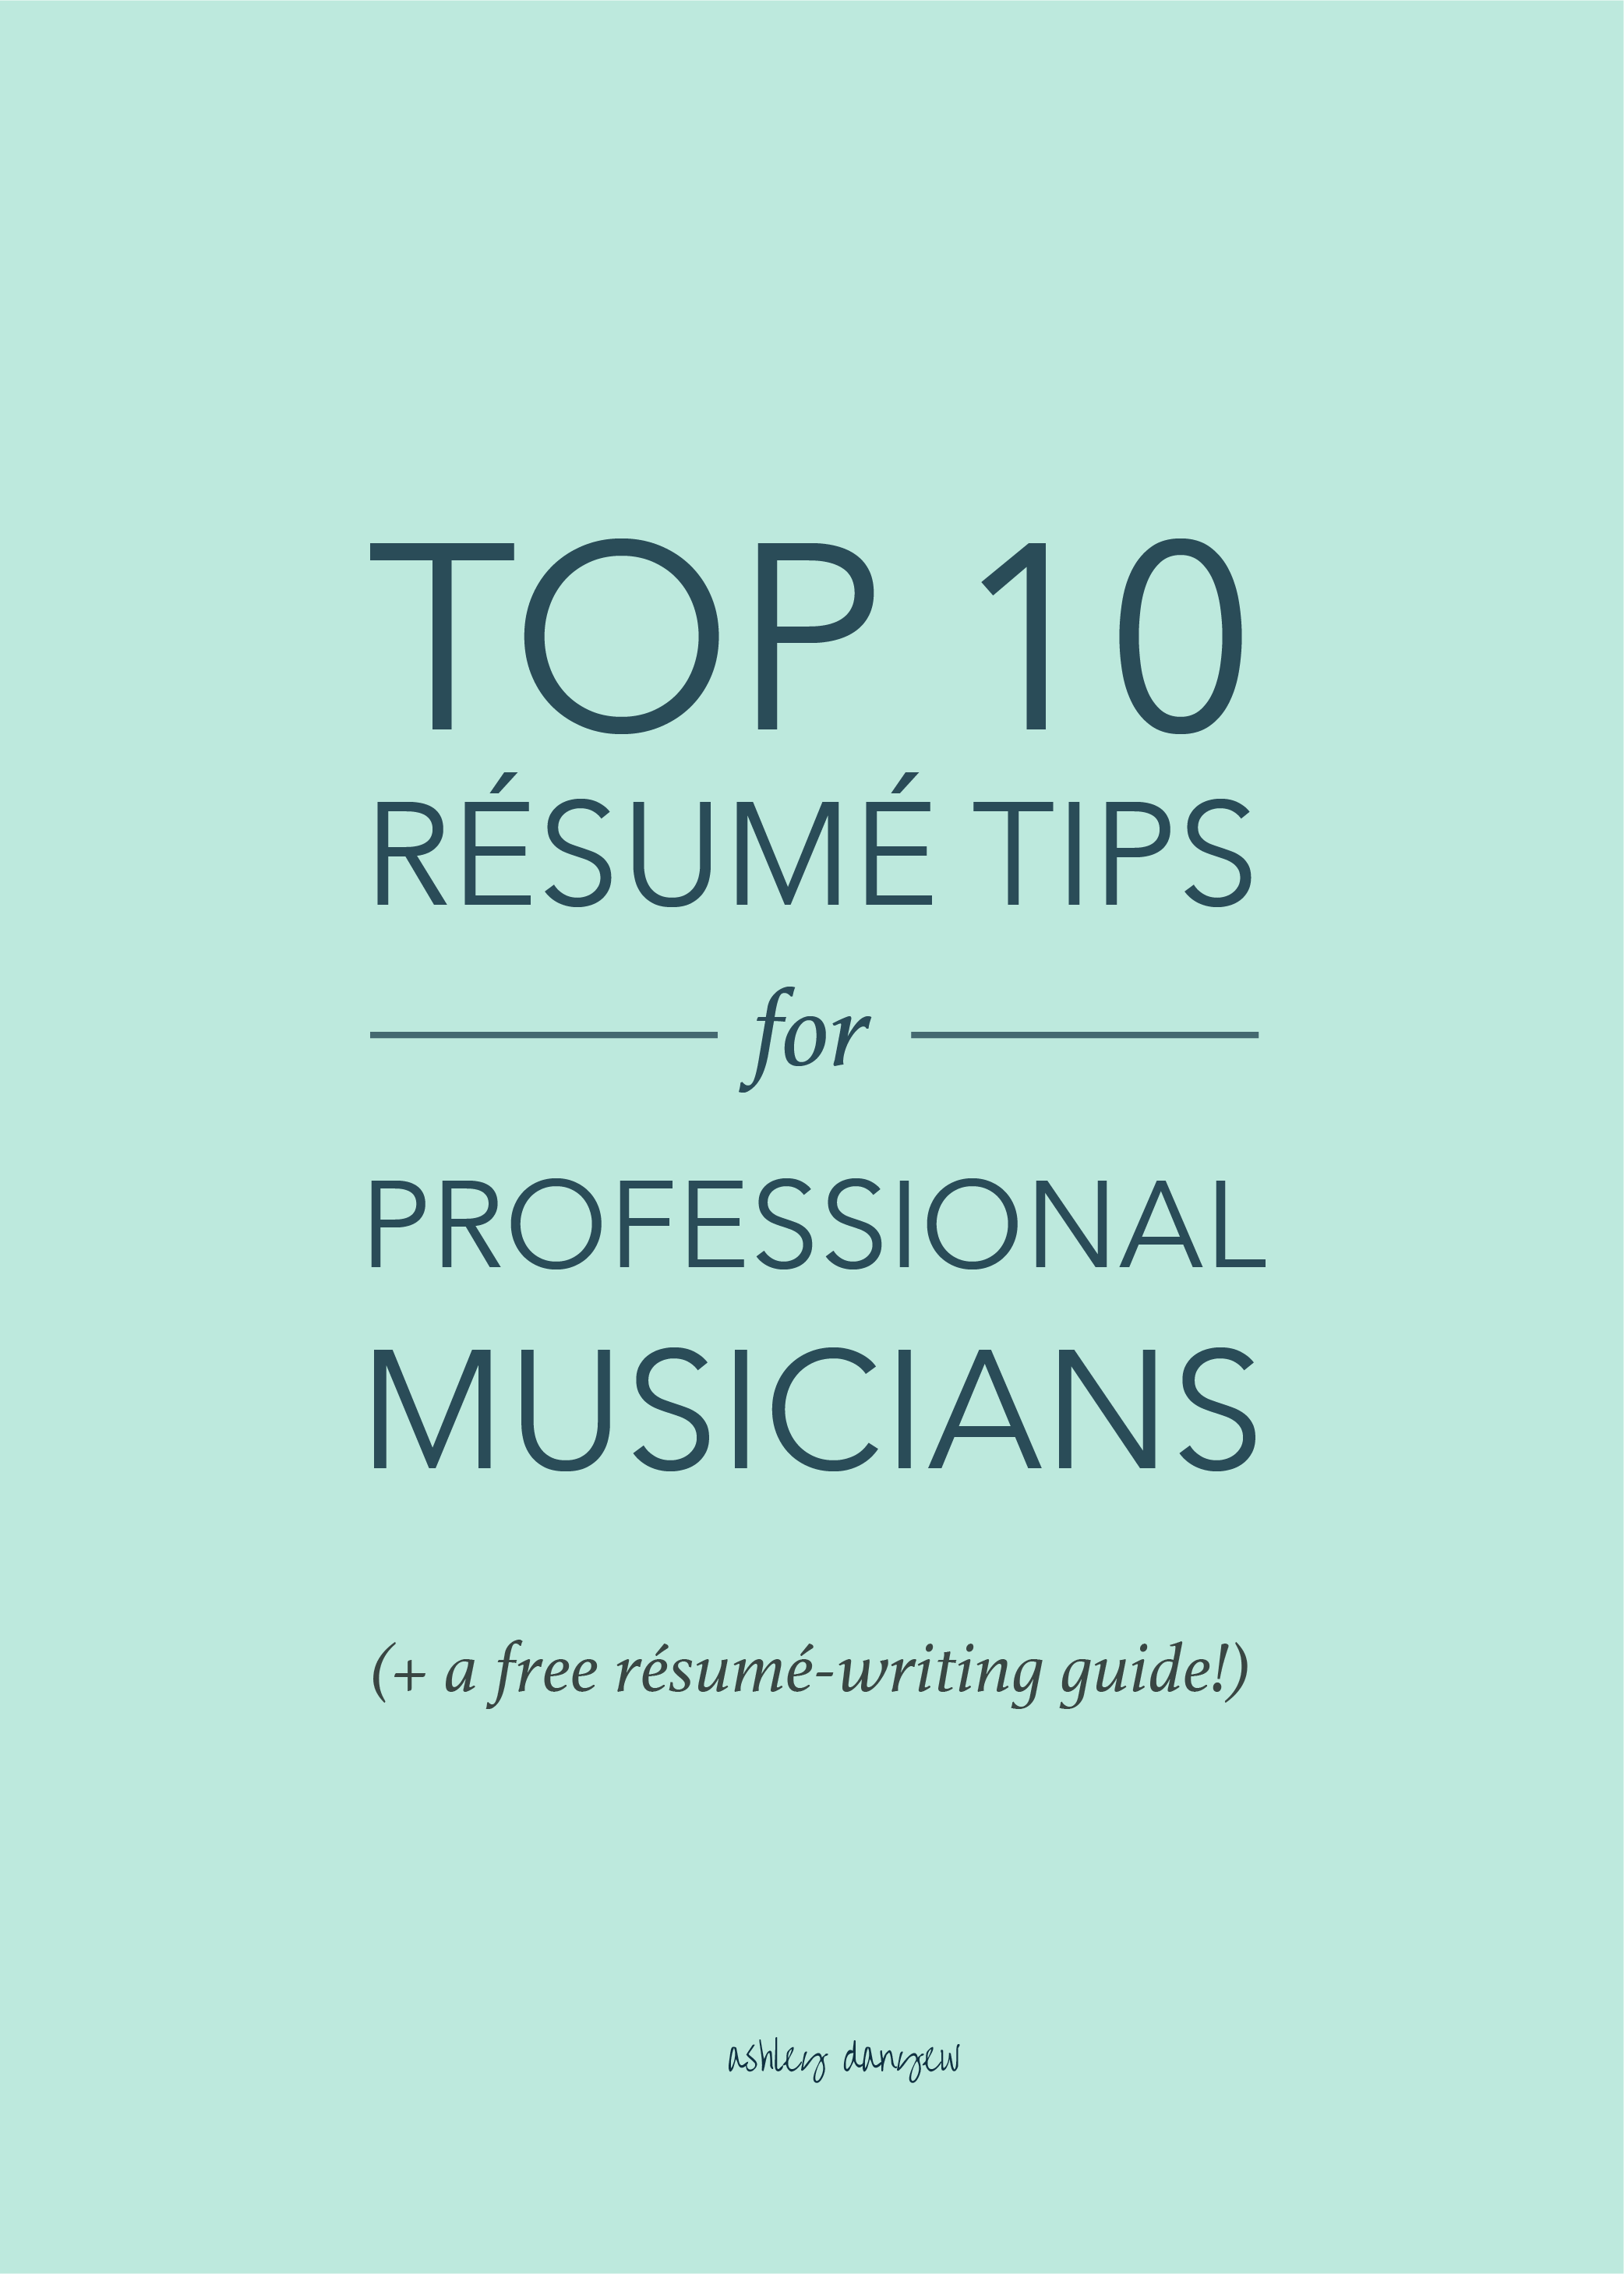 Professional Musicians.